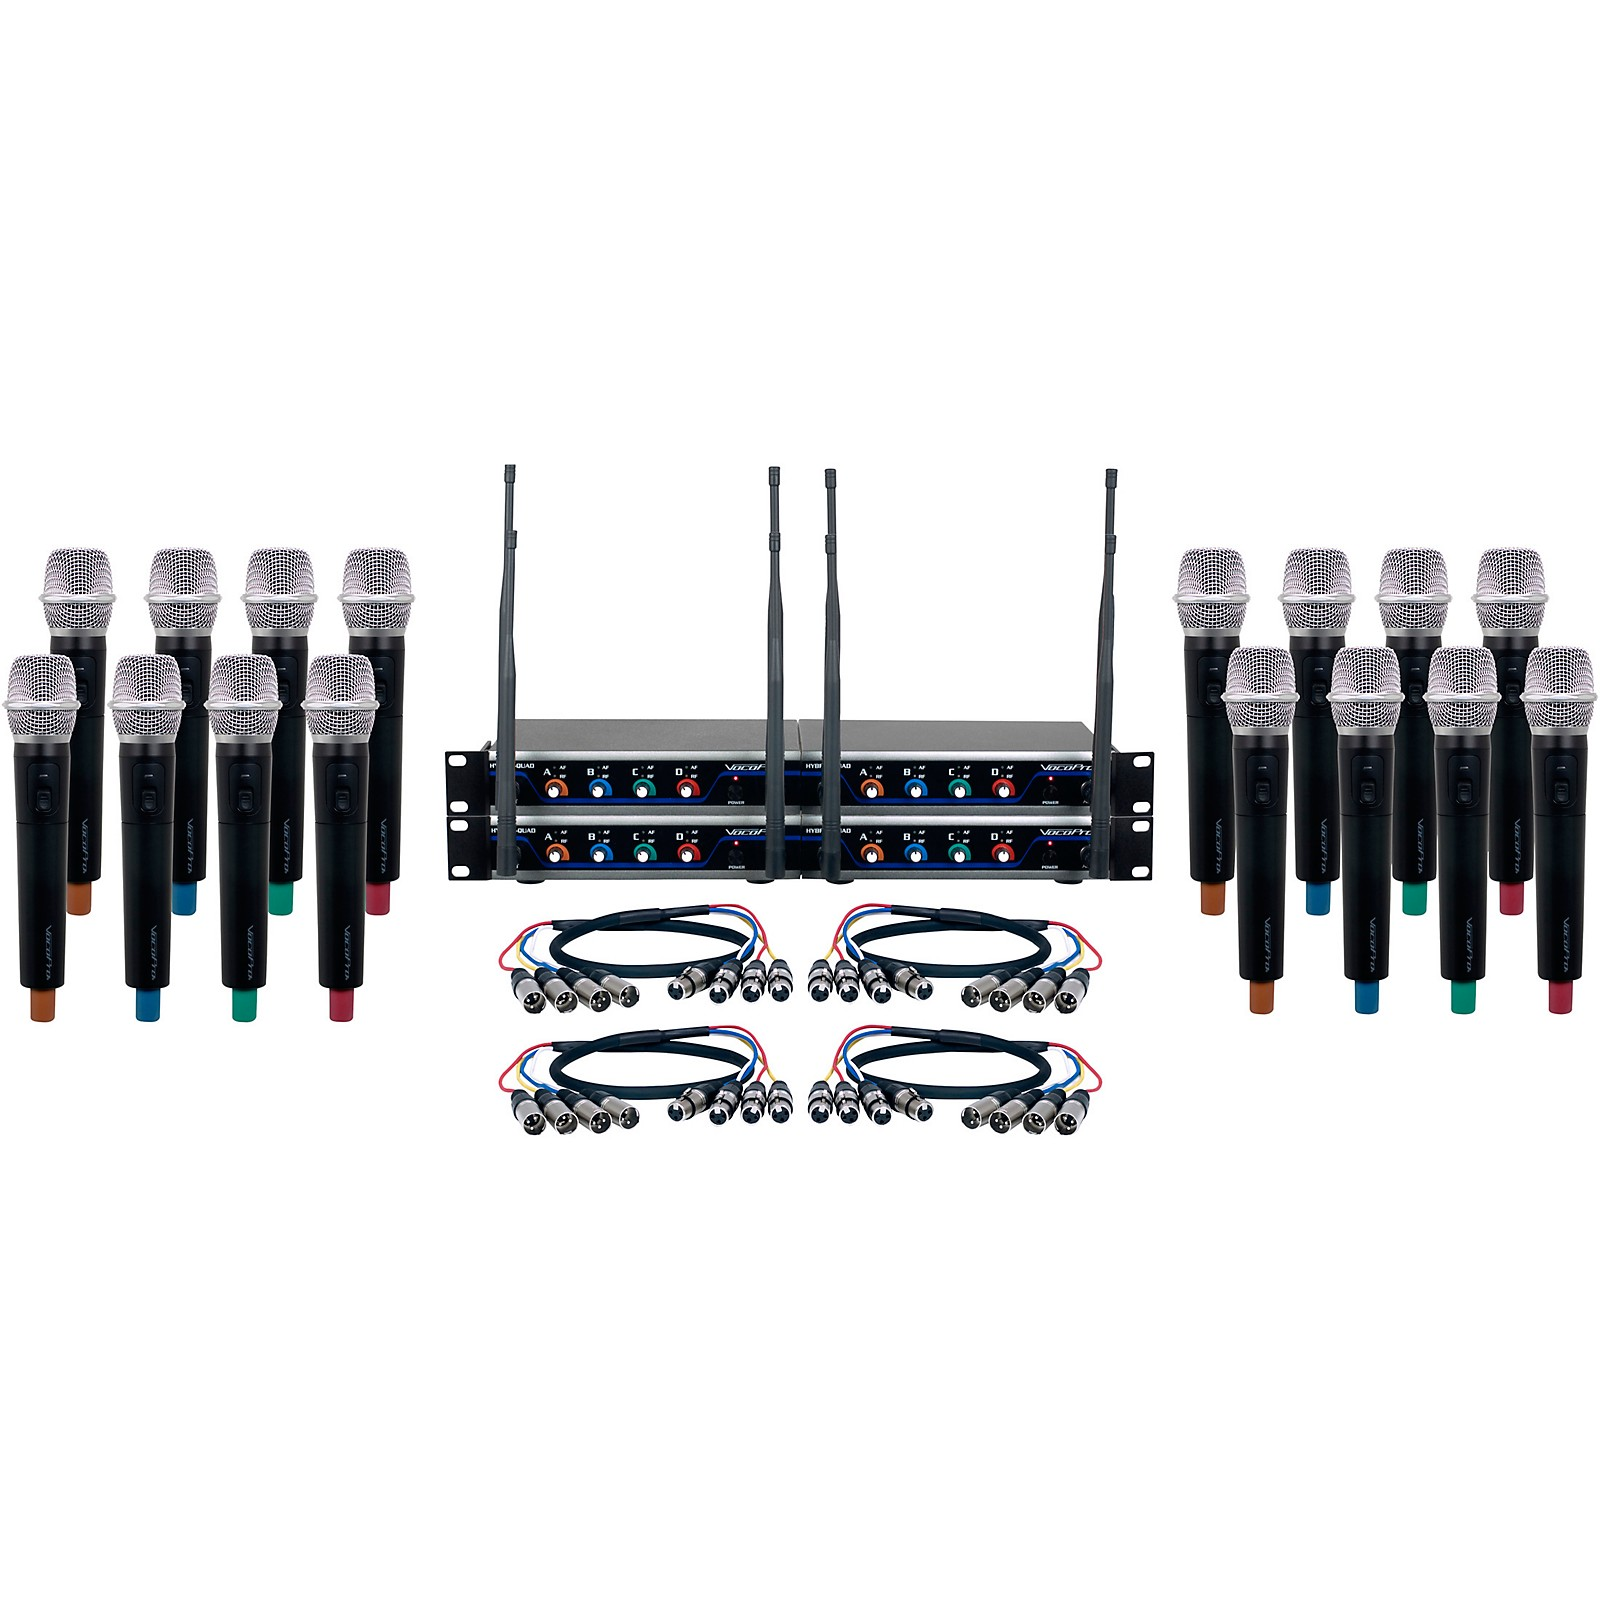 VocoPro Digital-Acapella-16 Wireless System